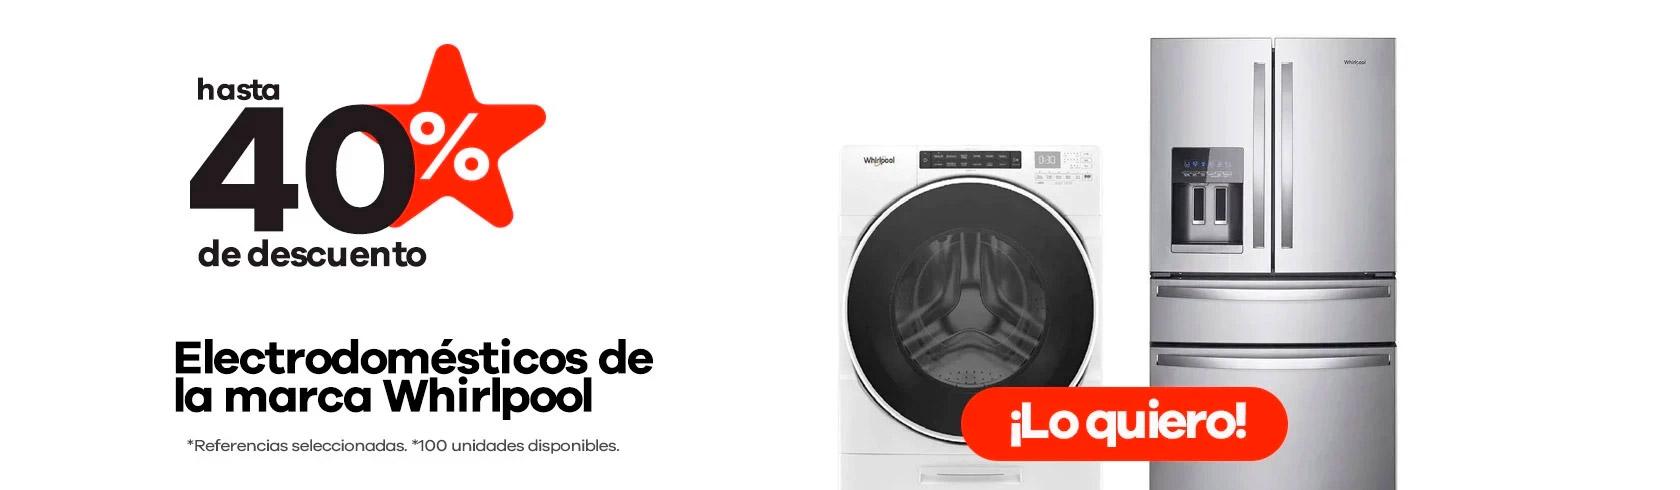 Electrodomésticos-samsung